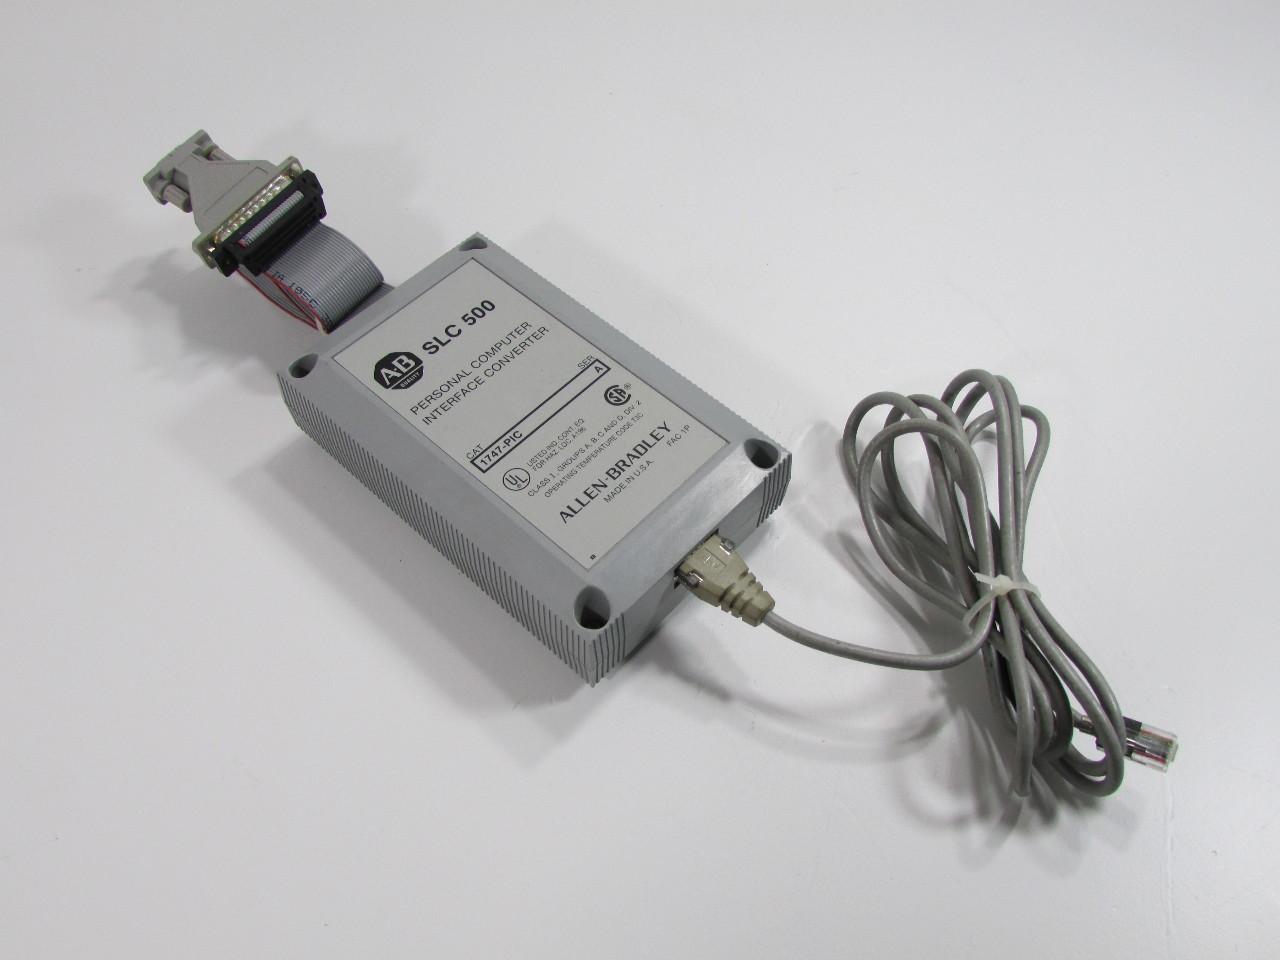 100 solar panel charge controller kiln temperature controller drake  #594C4B